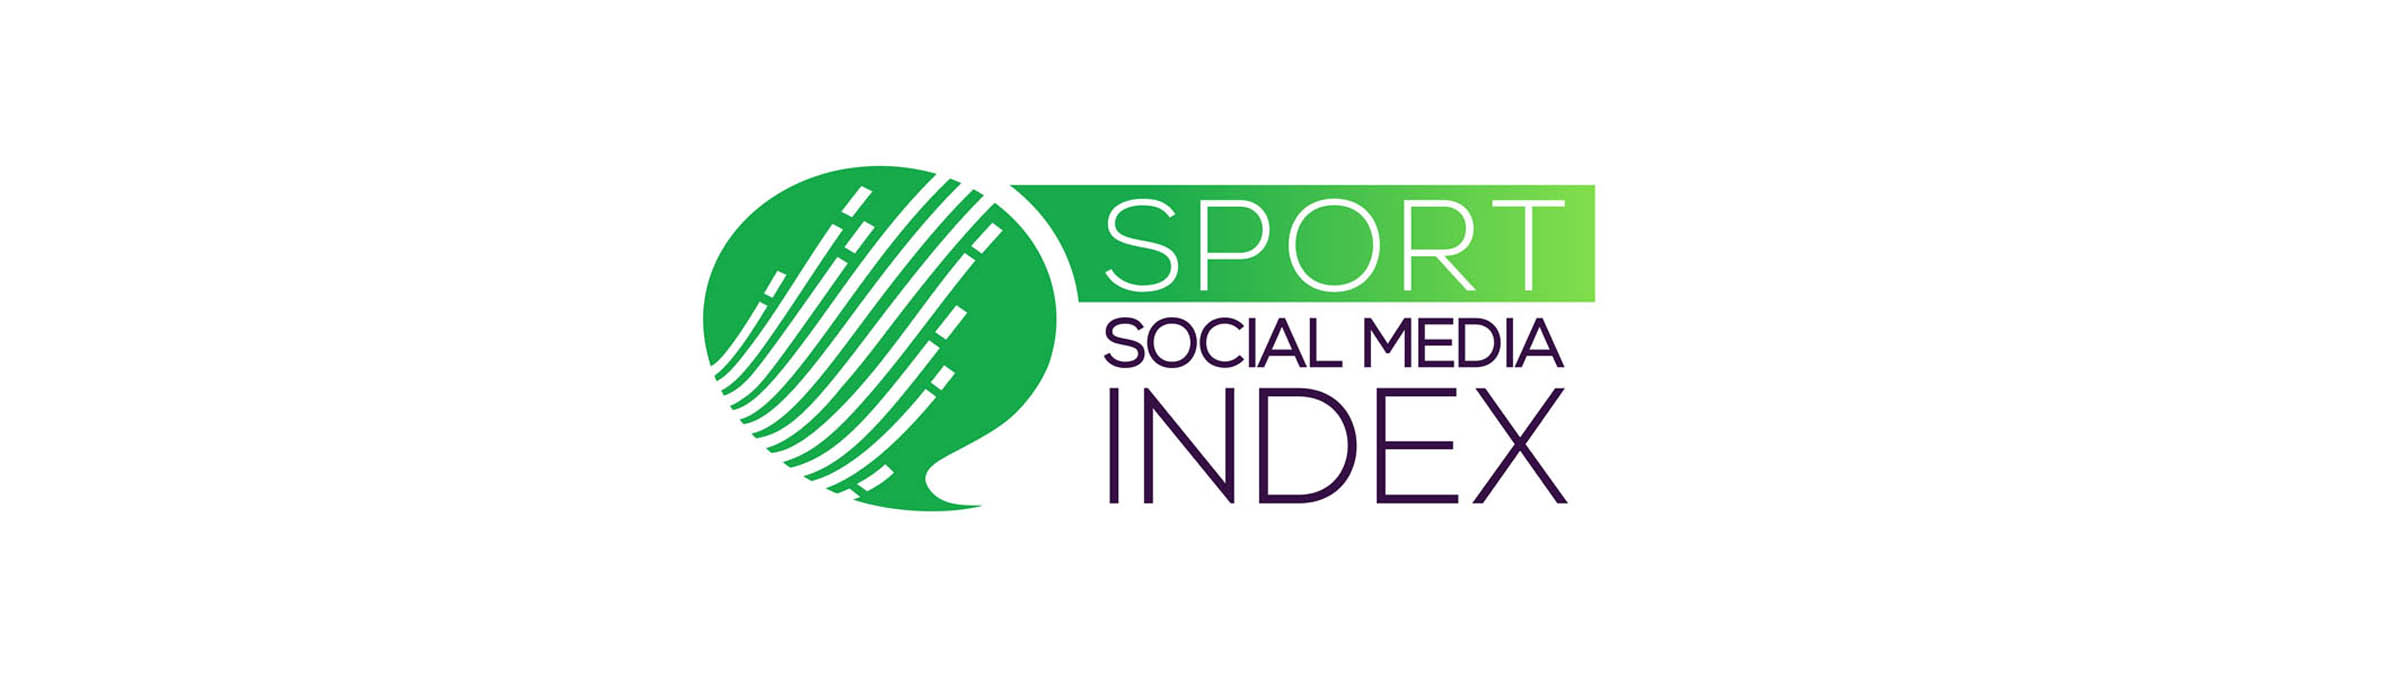 Sport Social Media Index logo cover